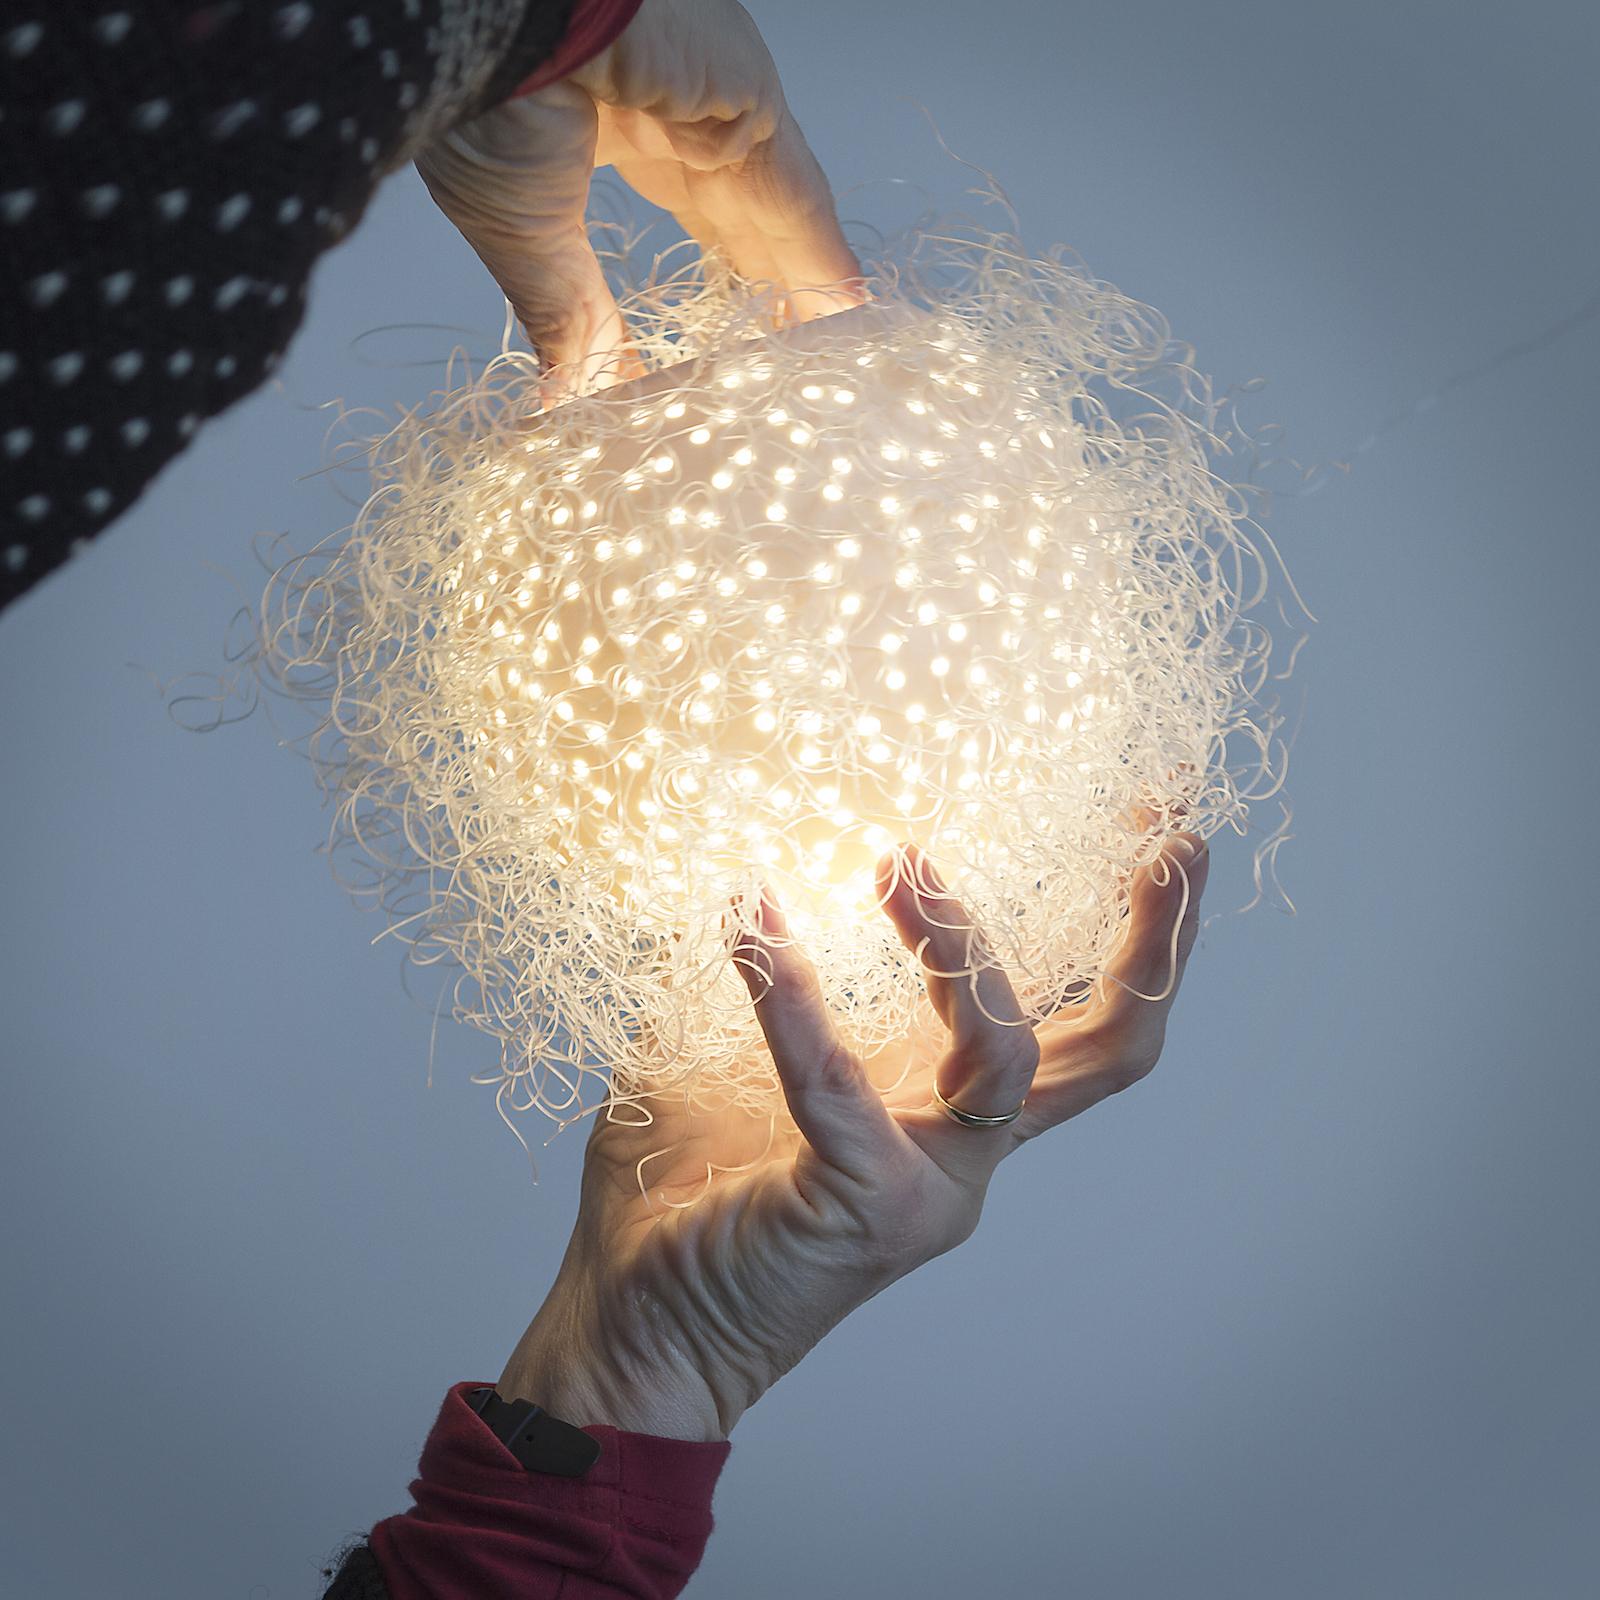 Hands holding porcelain globe pendant